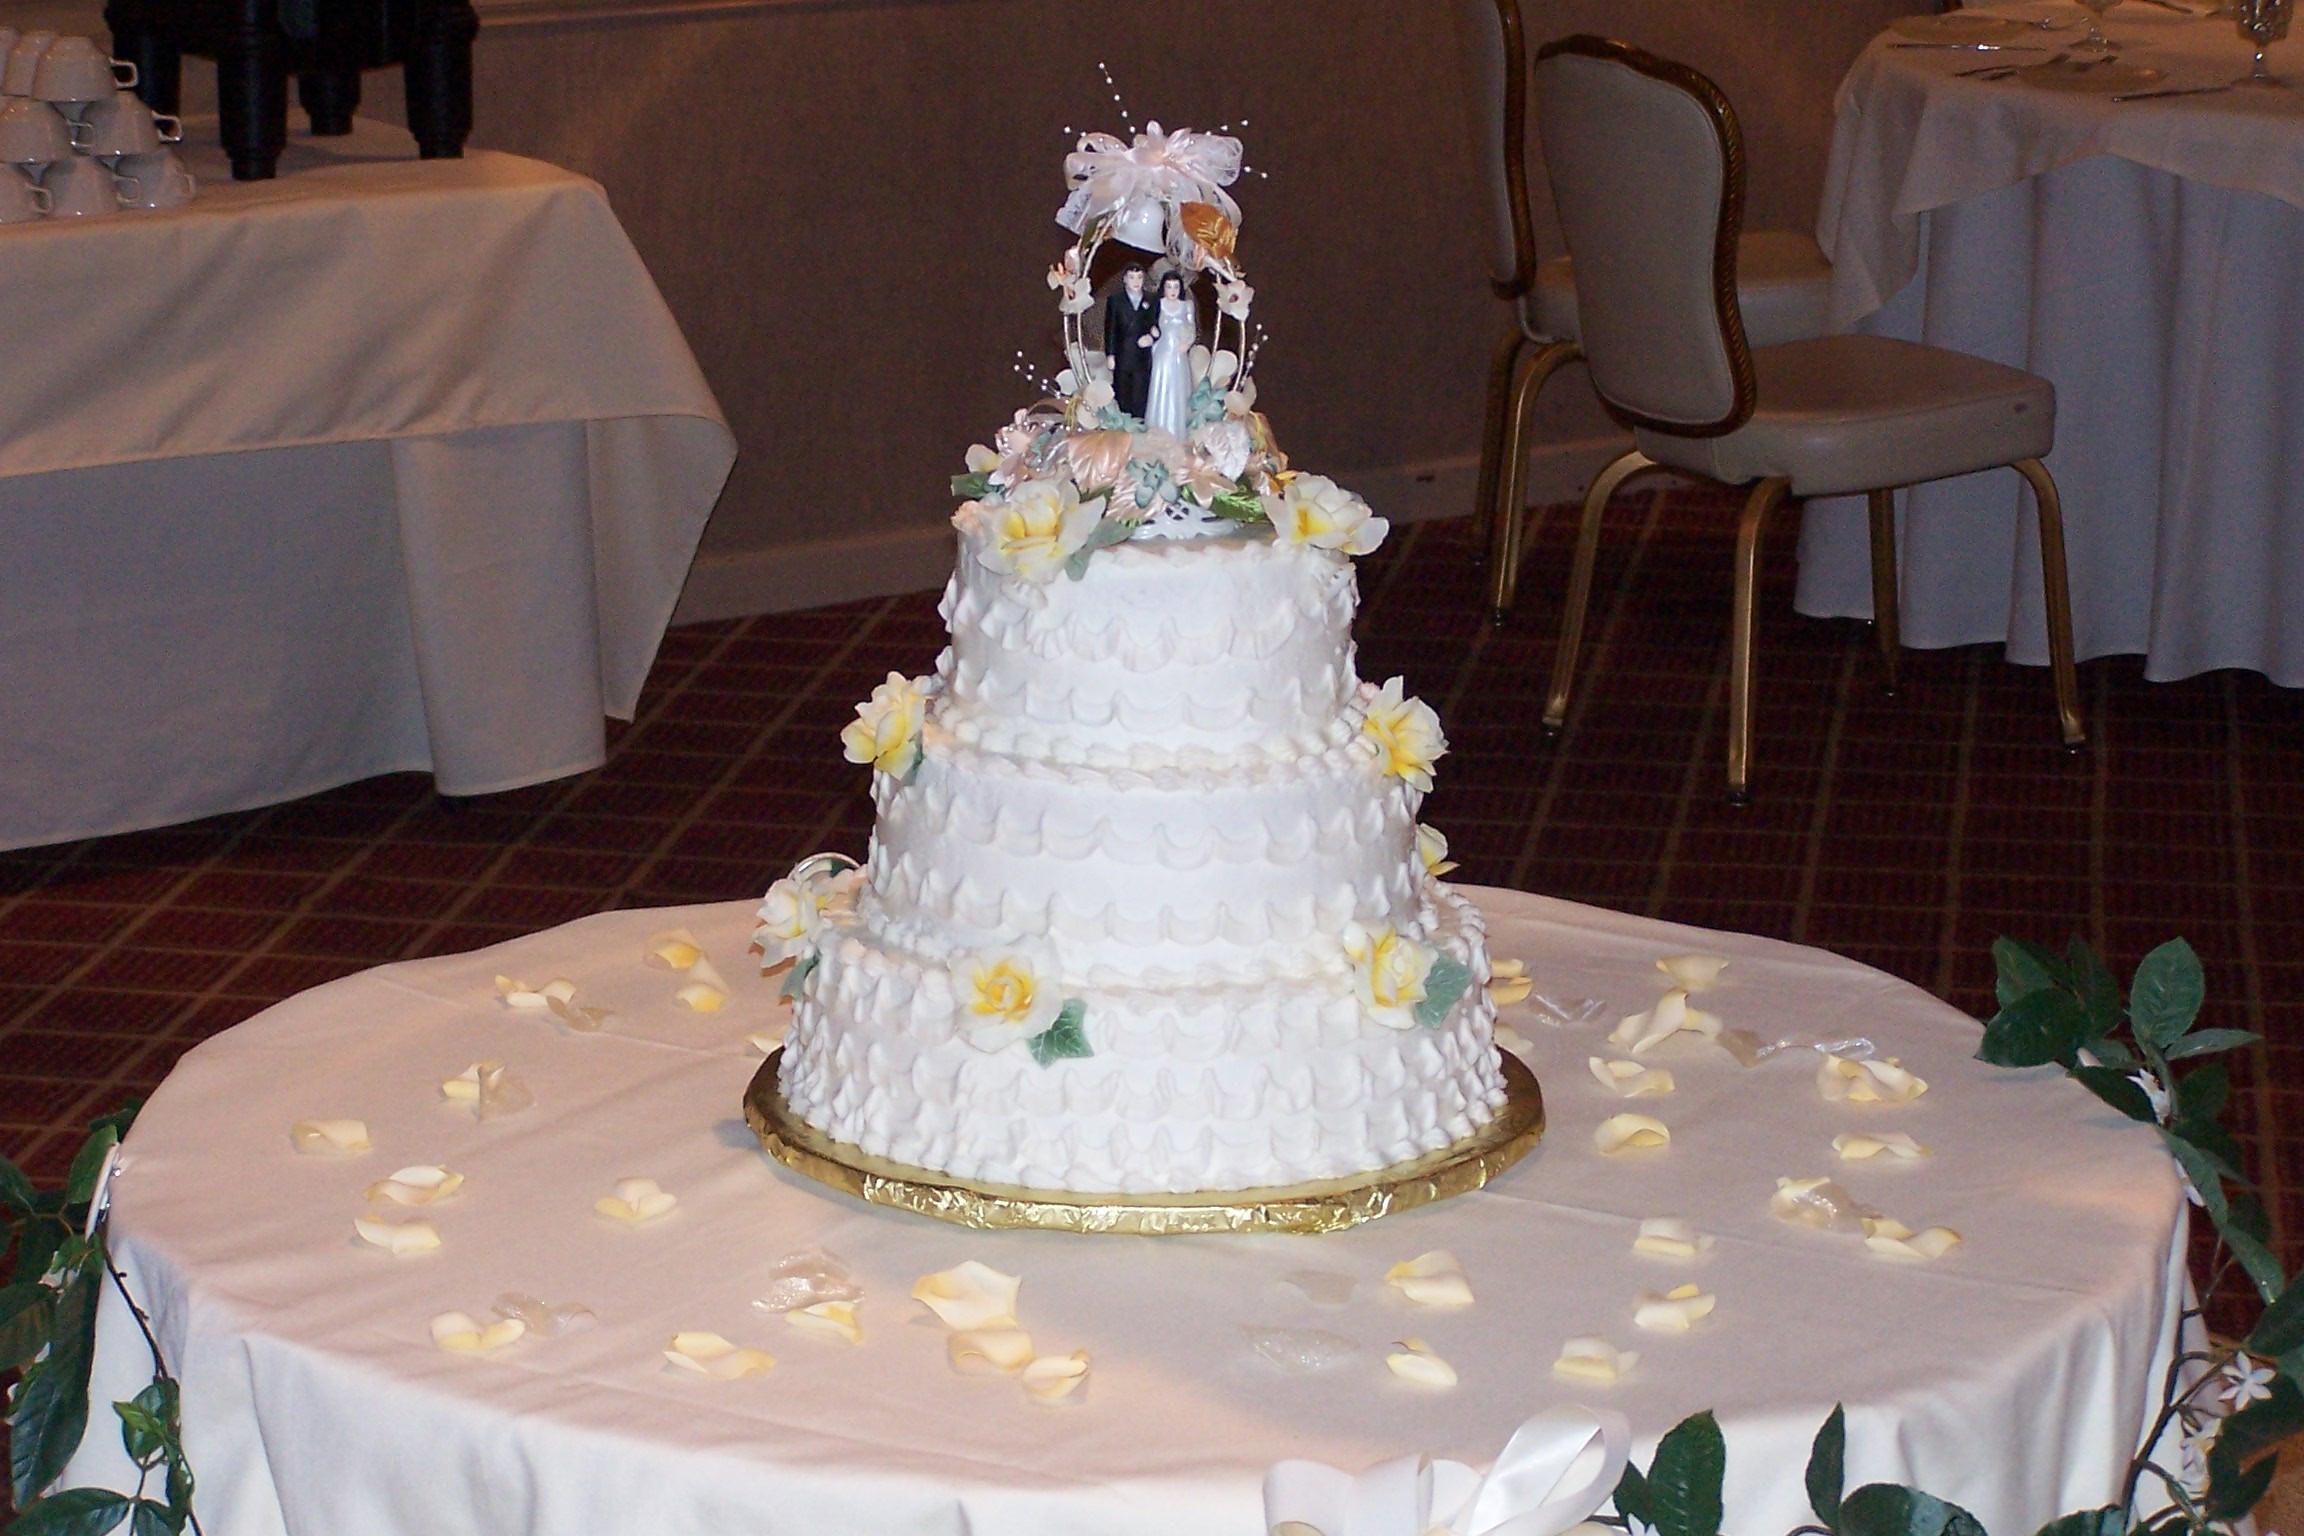 Wedding Cakes Show  PHOTO GALLERY Custom Cakes